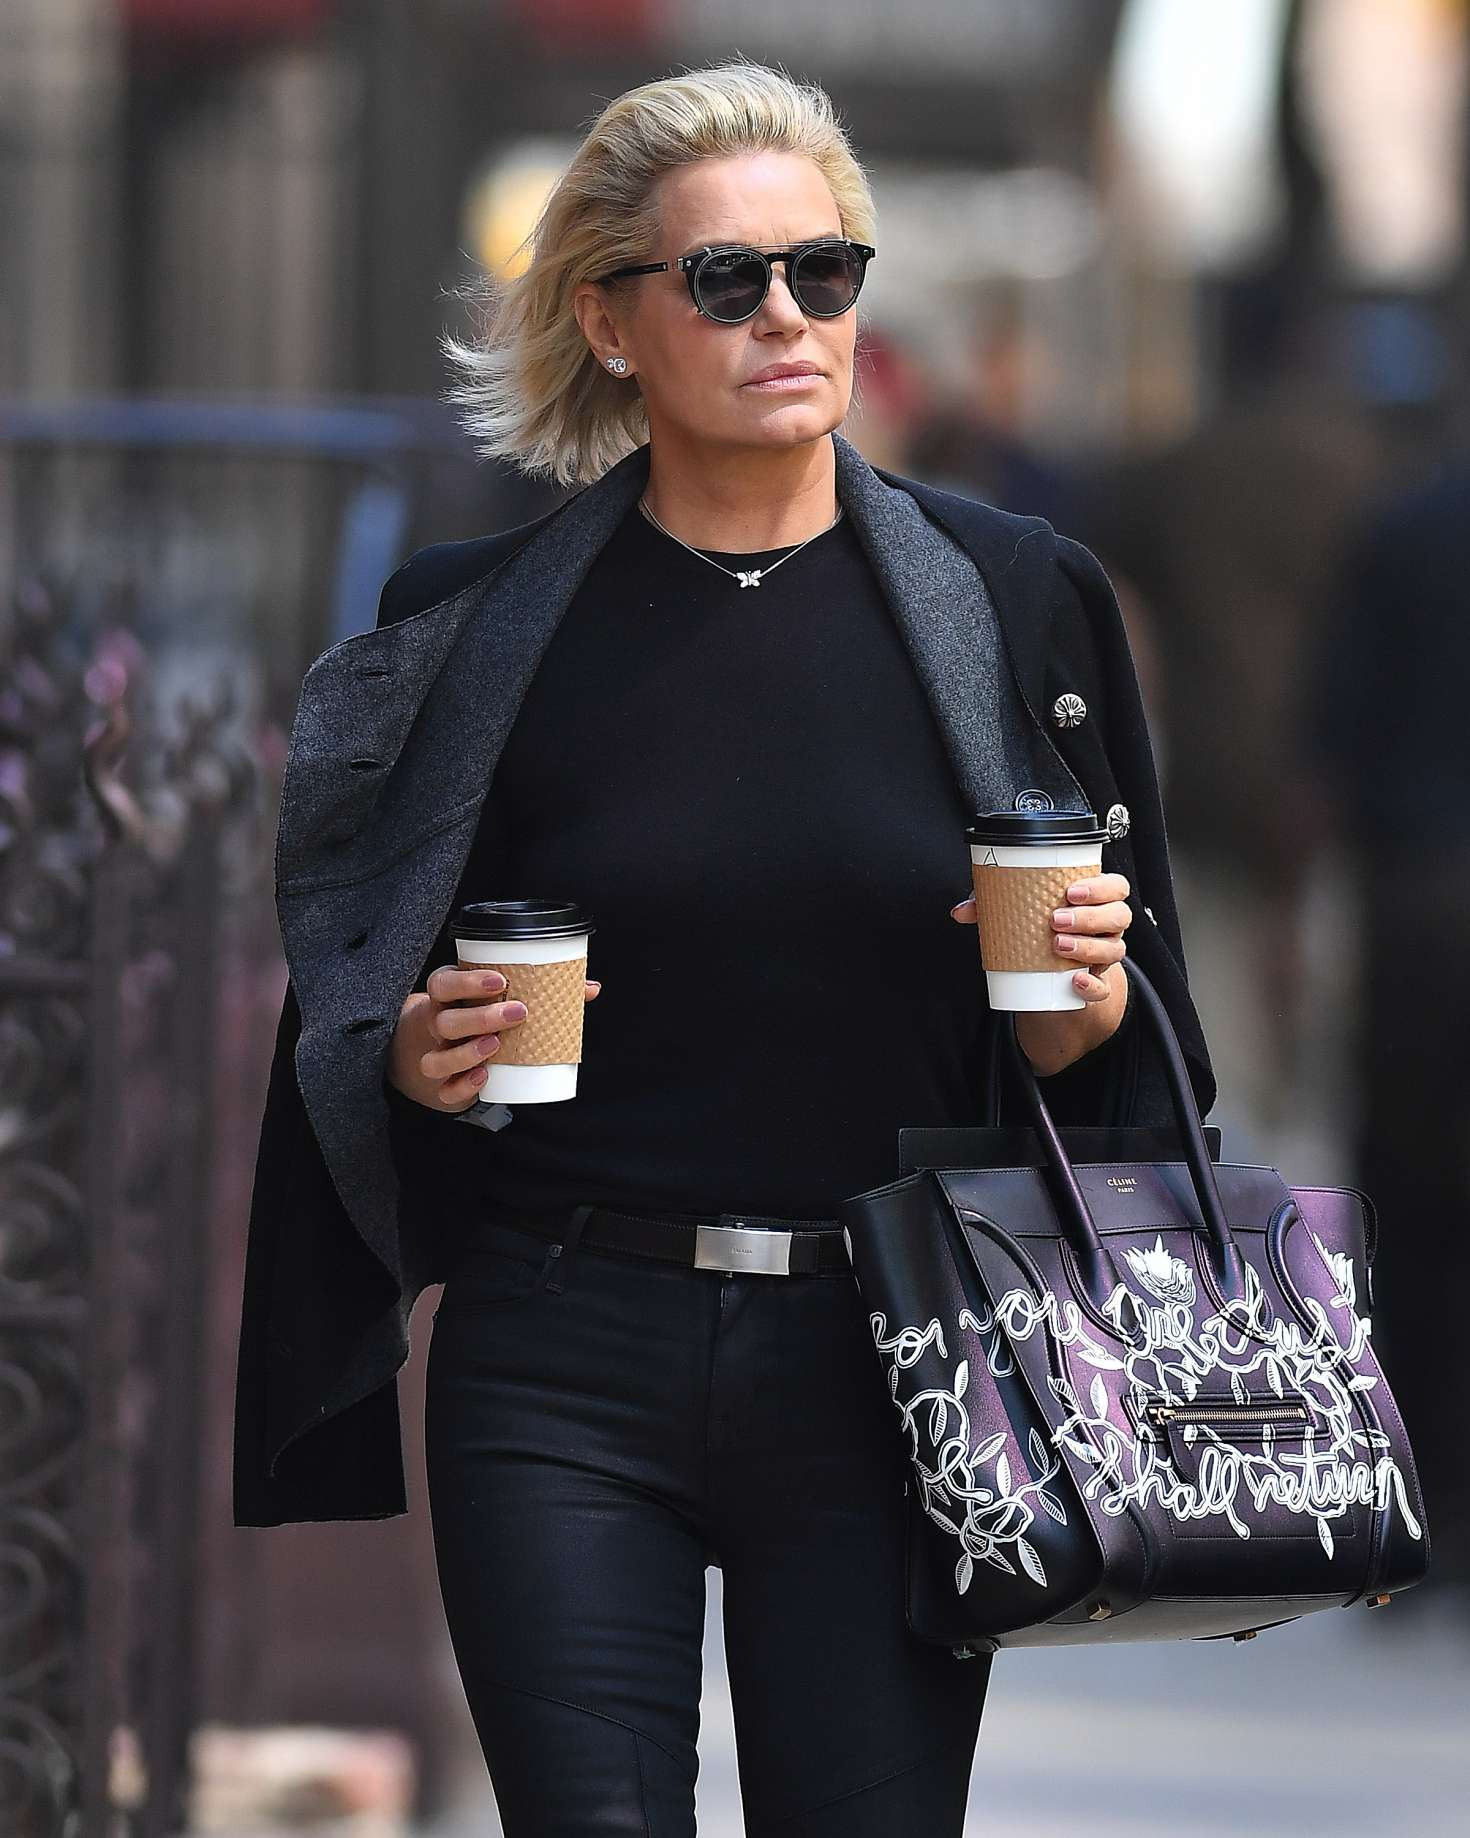 Yolanda Hadid out in New York City